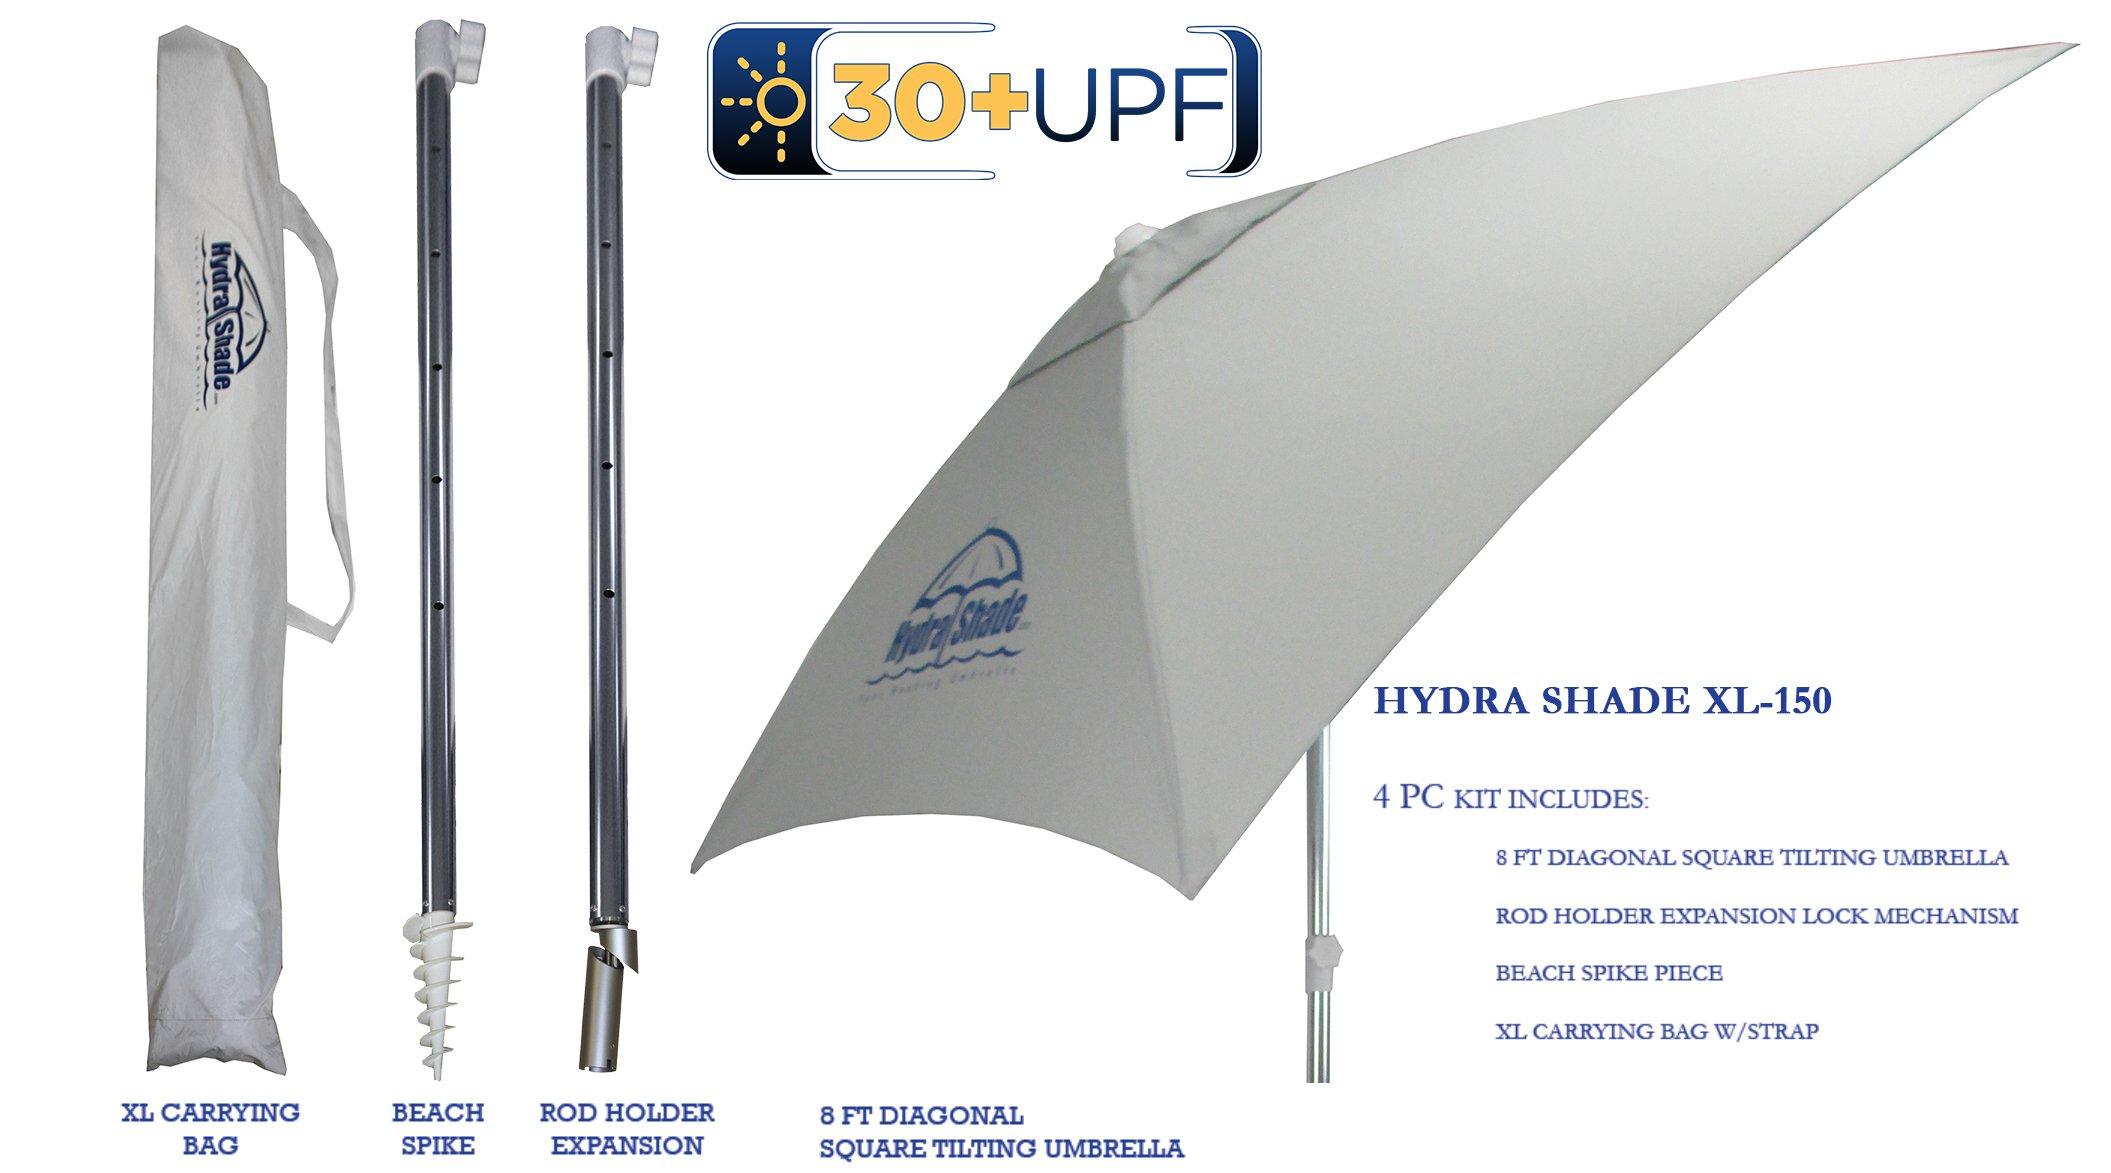 Hospitality Rattan XL-150 Hydra Shade 8' Square Boating & Beach Umbrella Kit, White by Hospitality Rattan (Image #12)